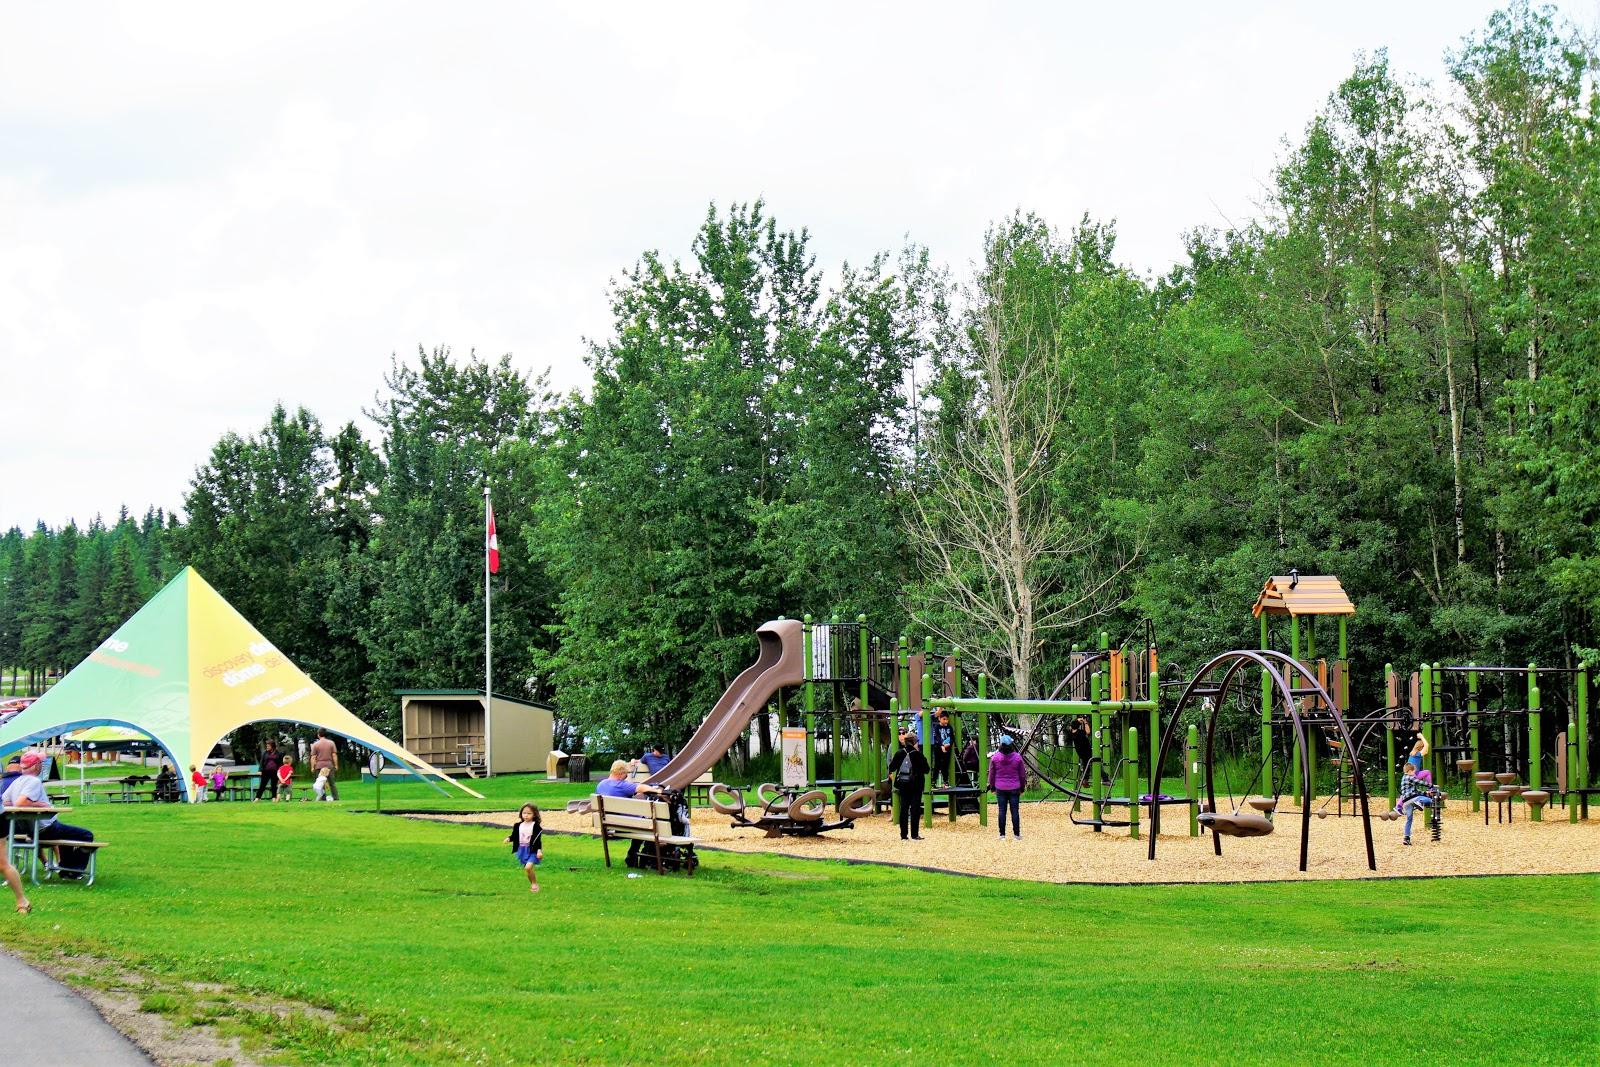 Astotin Lake Playground, Elk Island National Park